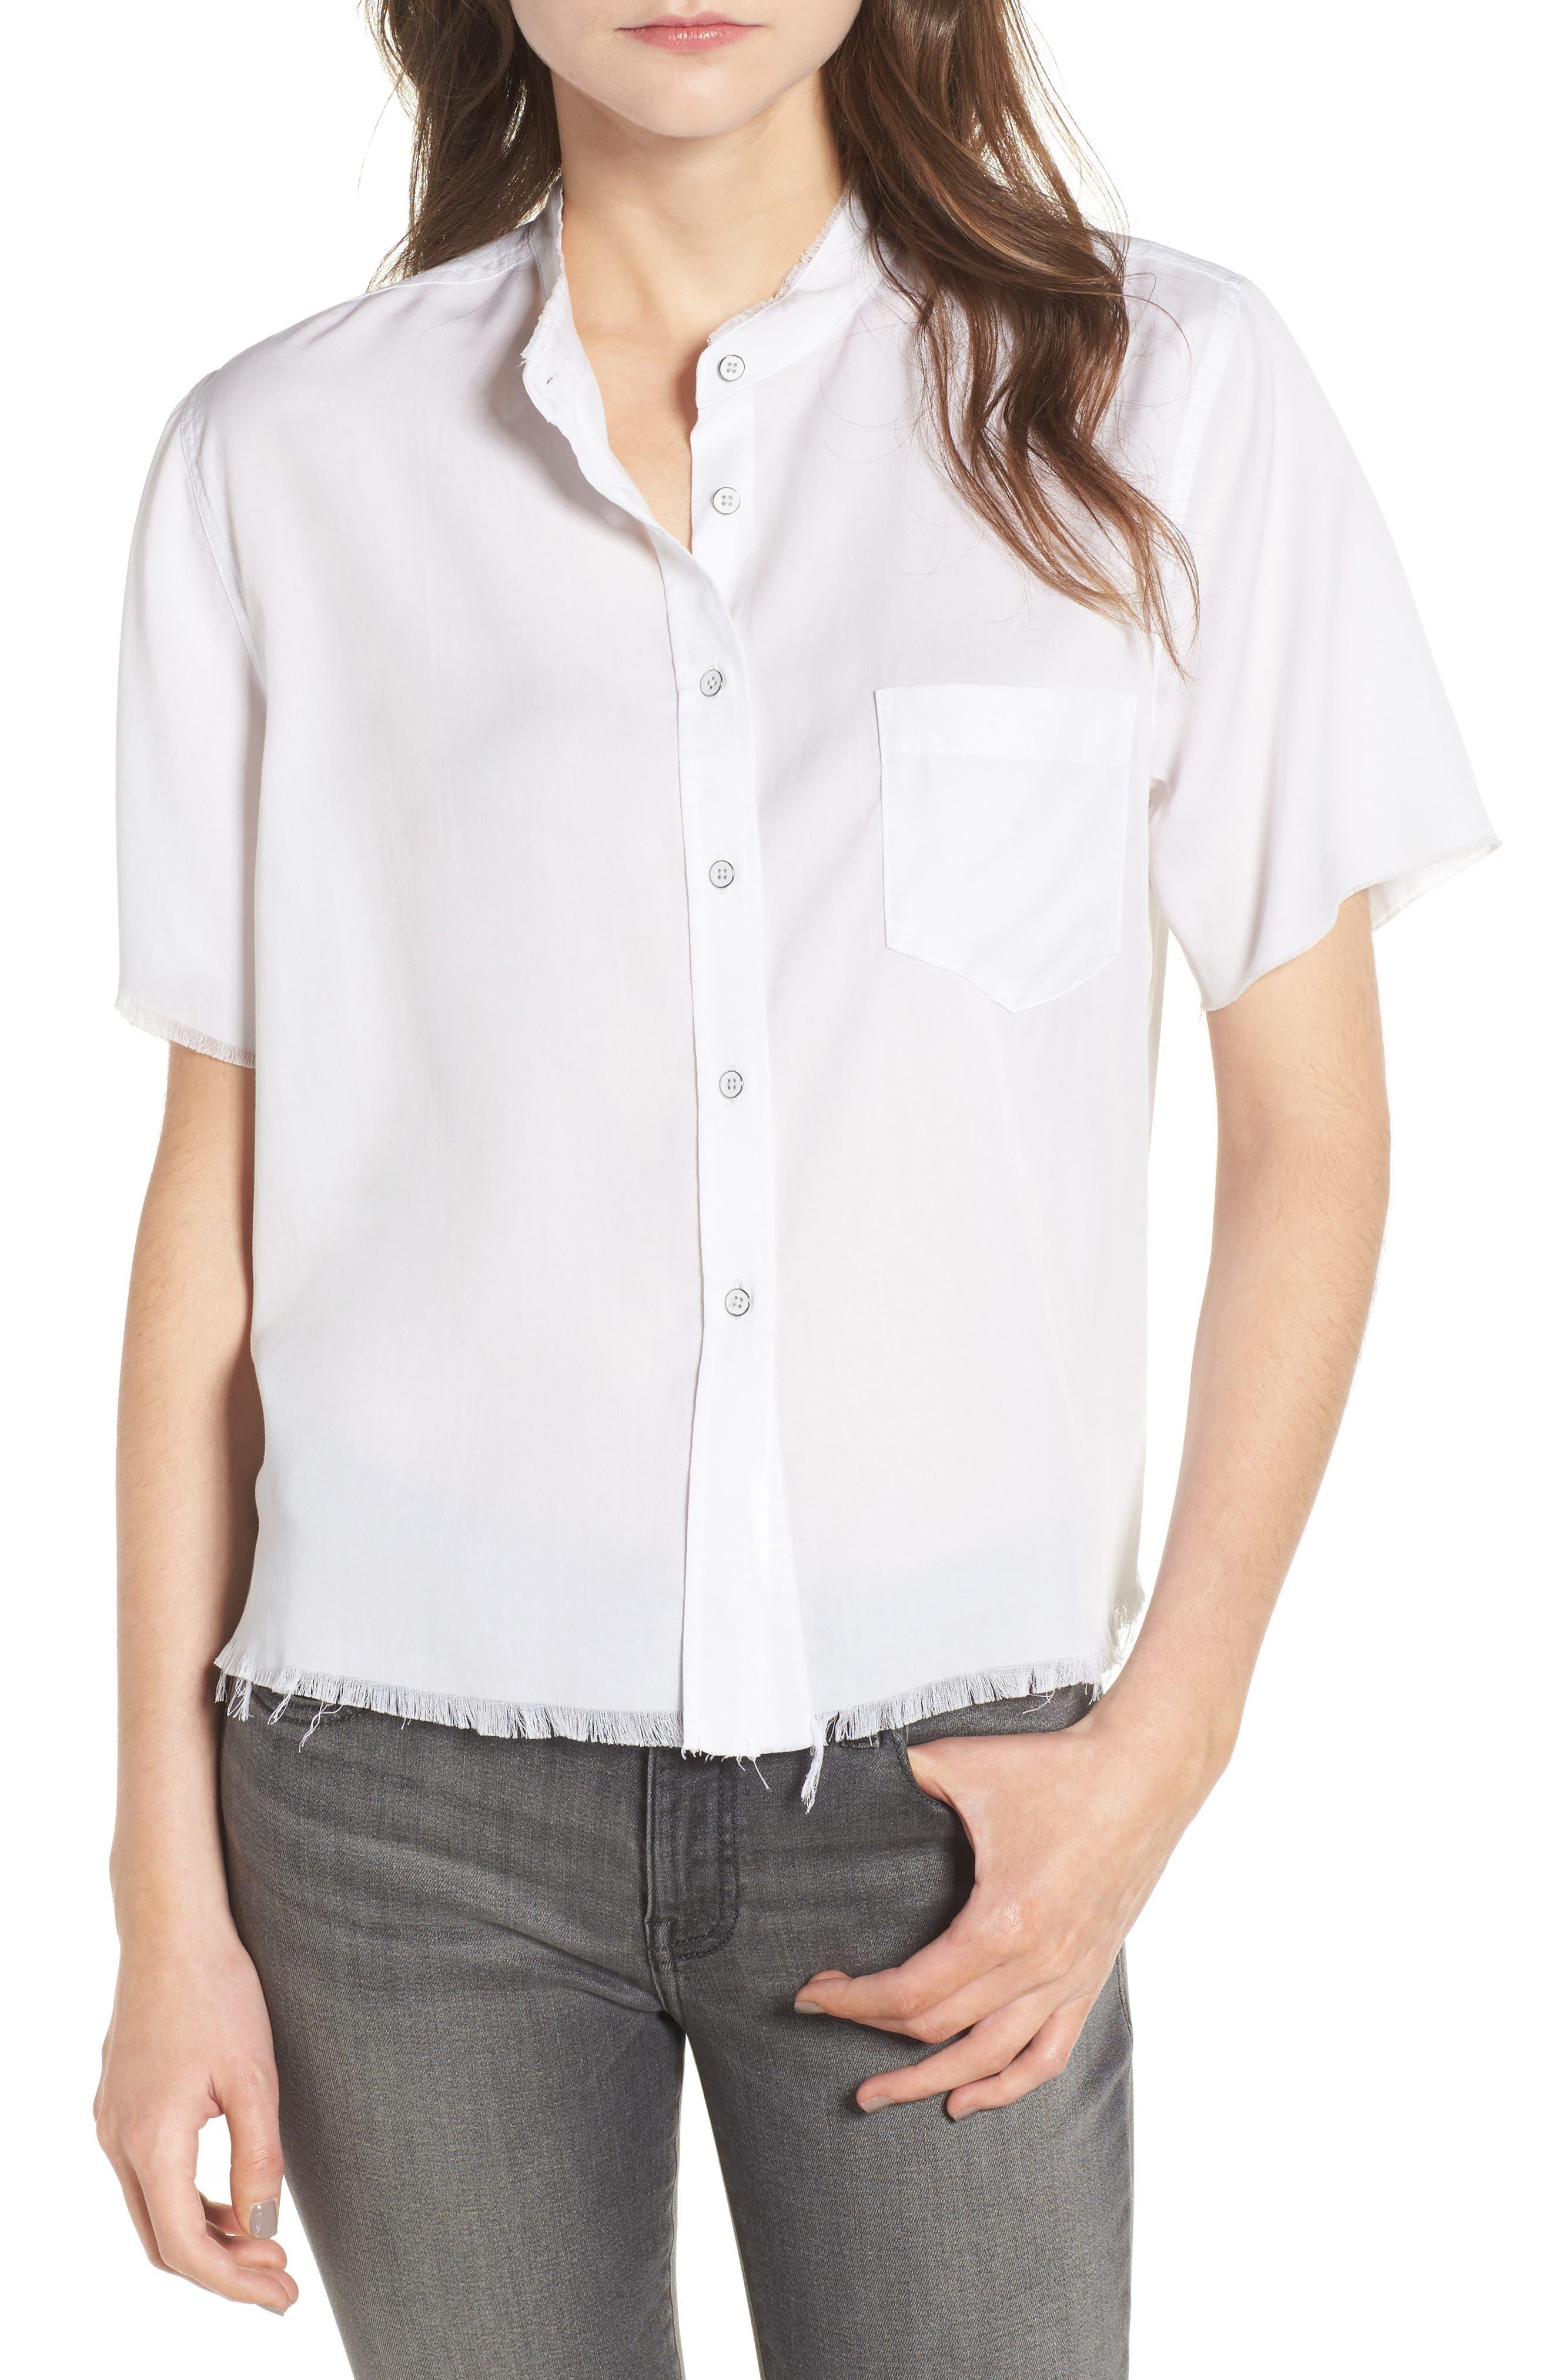 Montauk Shirt,                         Main,                         color, 100